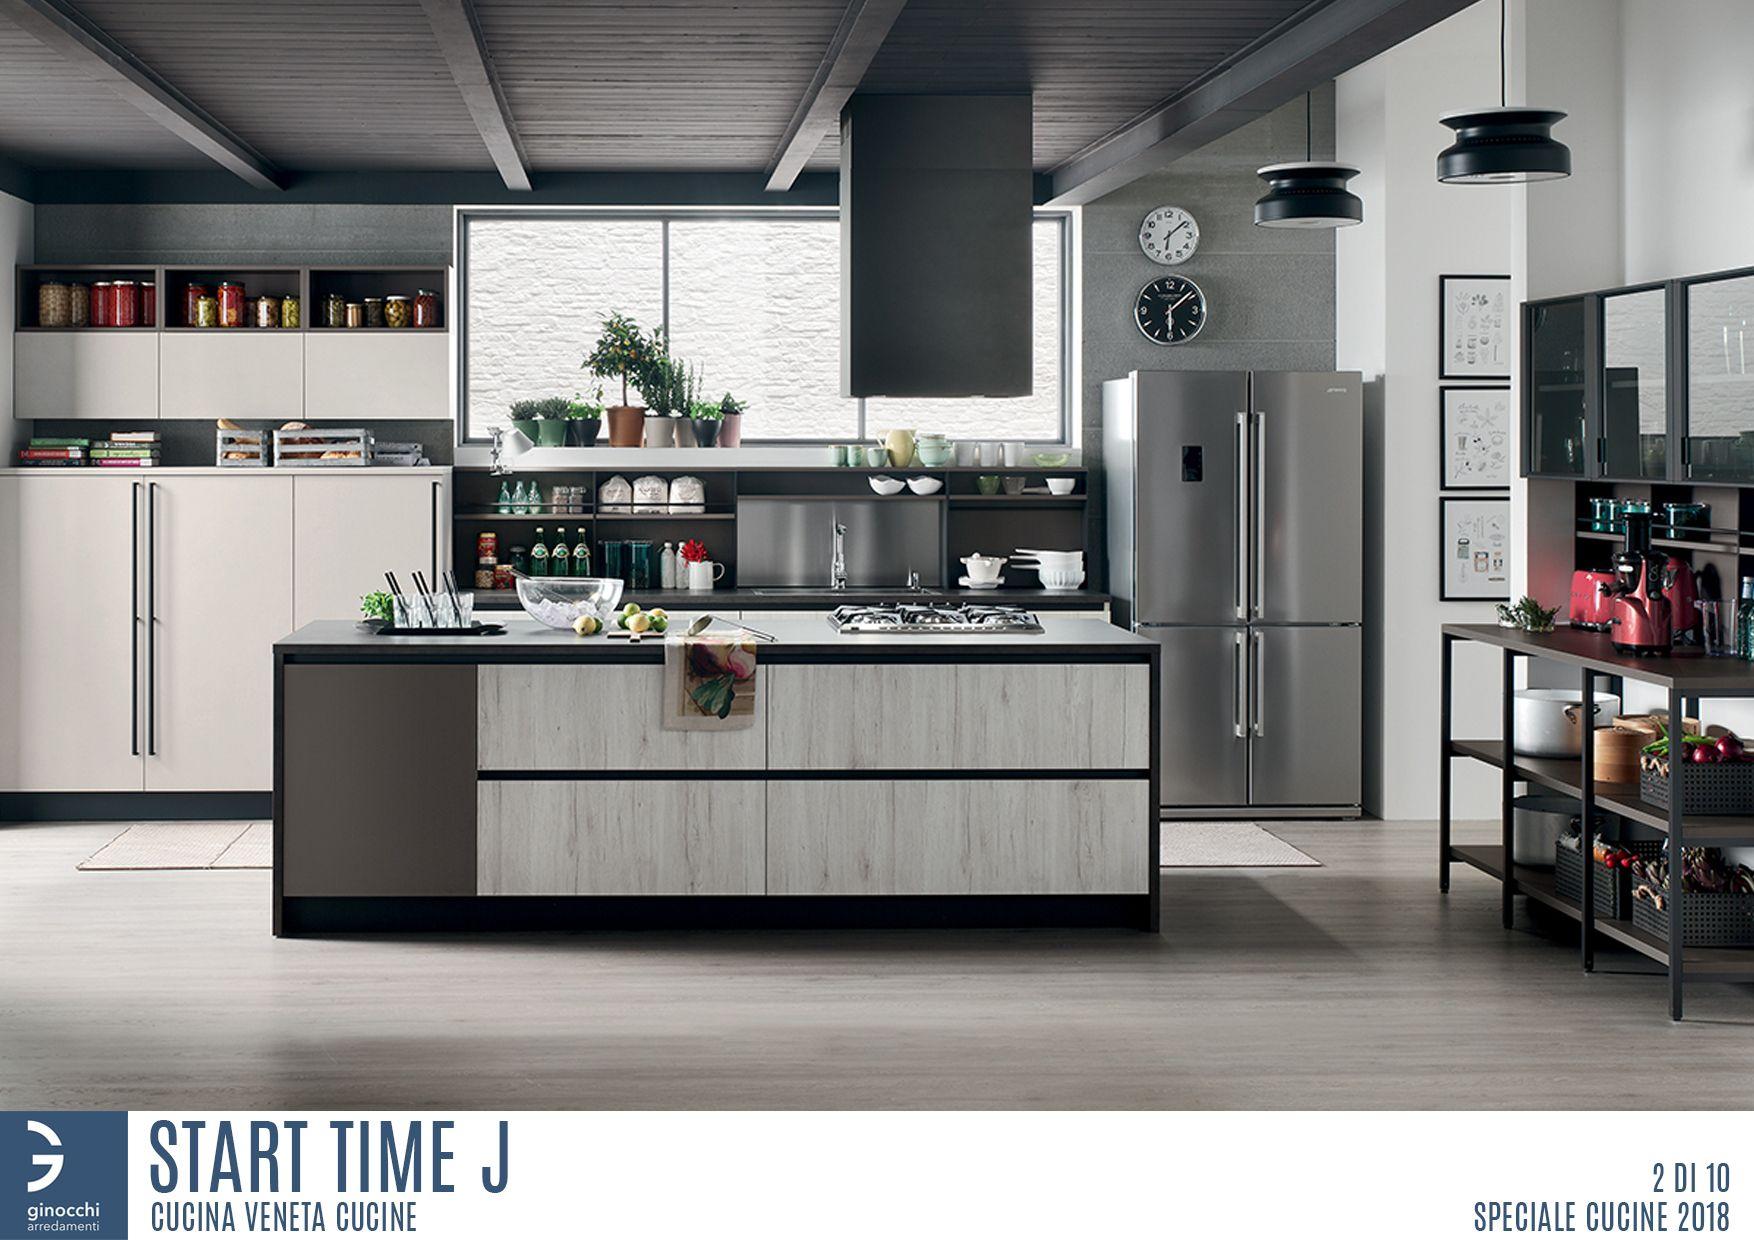 Catalogo Speciale Cucine Moderne 2018 Ginocchi